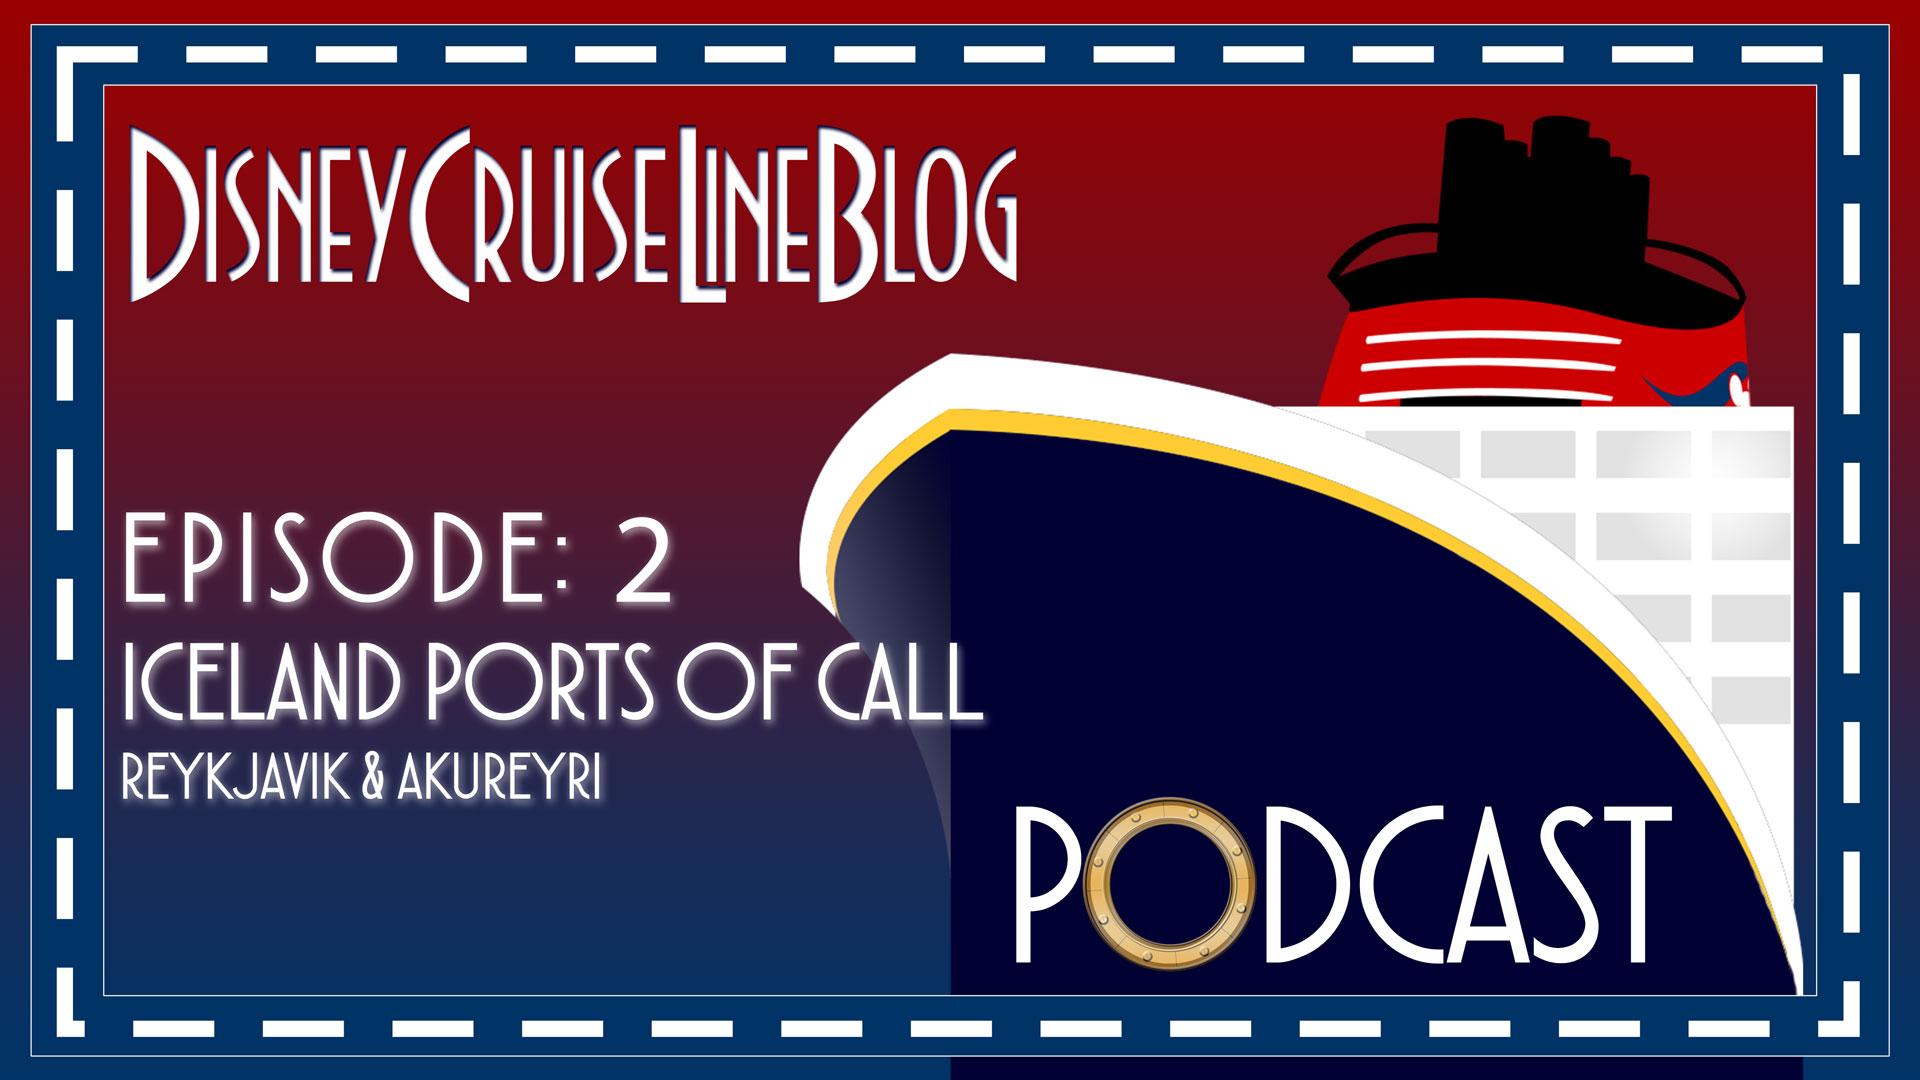 DCL Blog Podcast Episode 2 Iceland Ports Of Call Reykjavik Akureyri